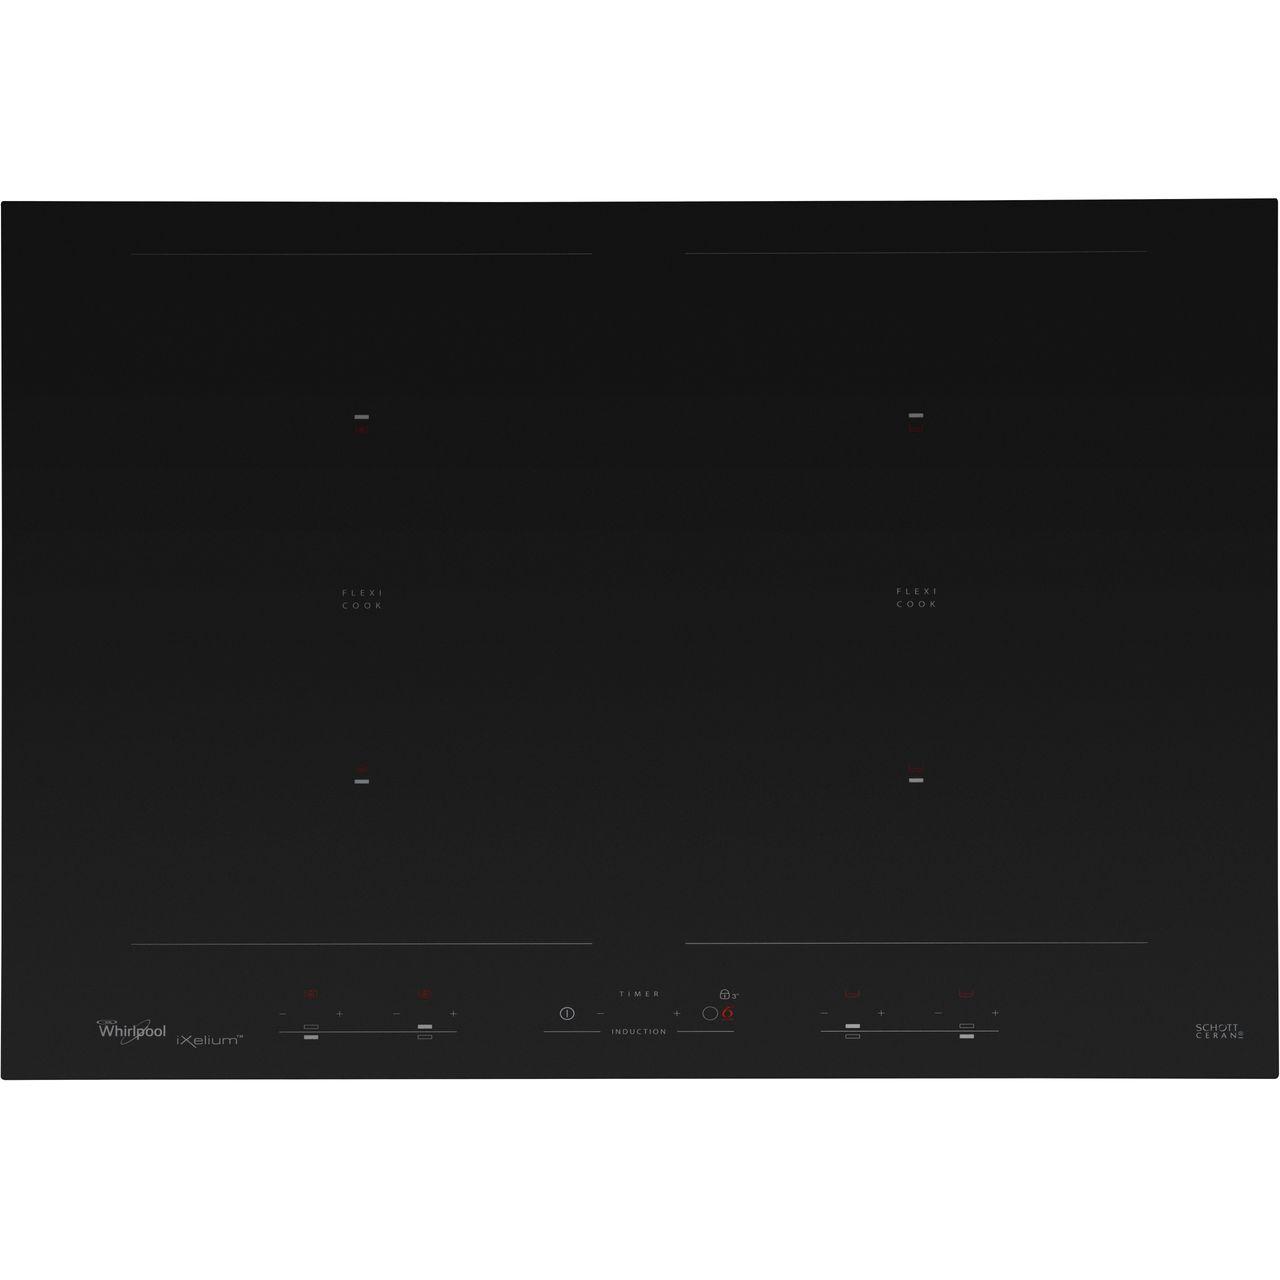 100% authentique a77c5 aaaed Whirlpool ACM868/BA/IXL 65cm Induction Hob - Black